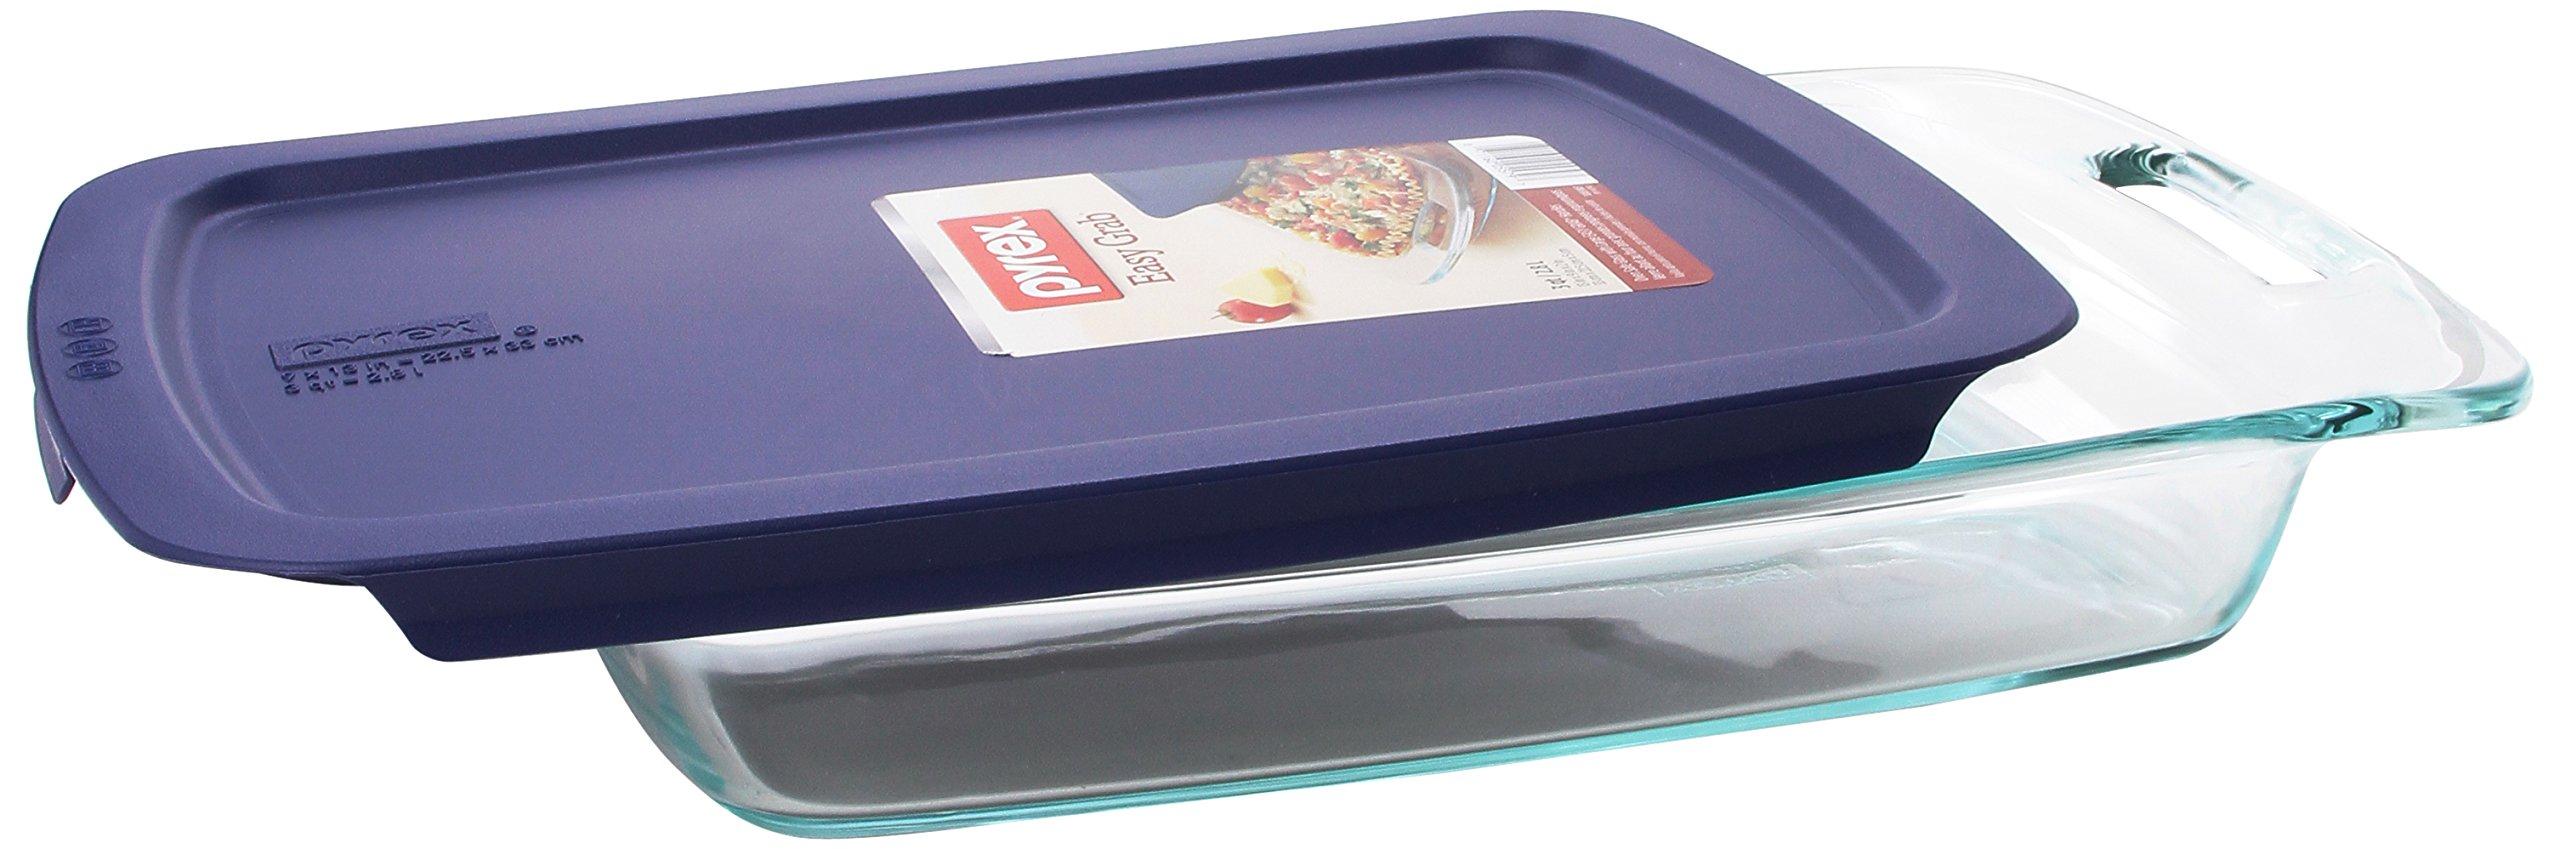 Pyrex Easy Grab 3-Quart Oblong Baking Dish by Pyrex